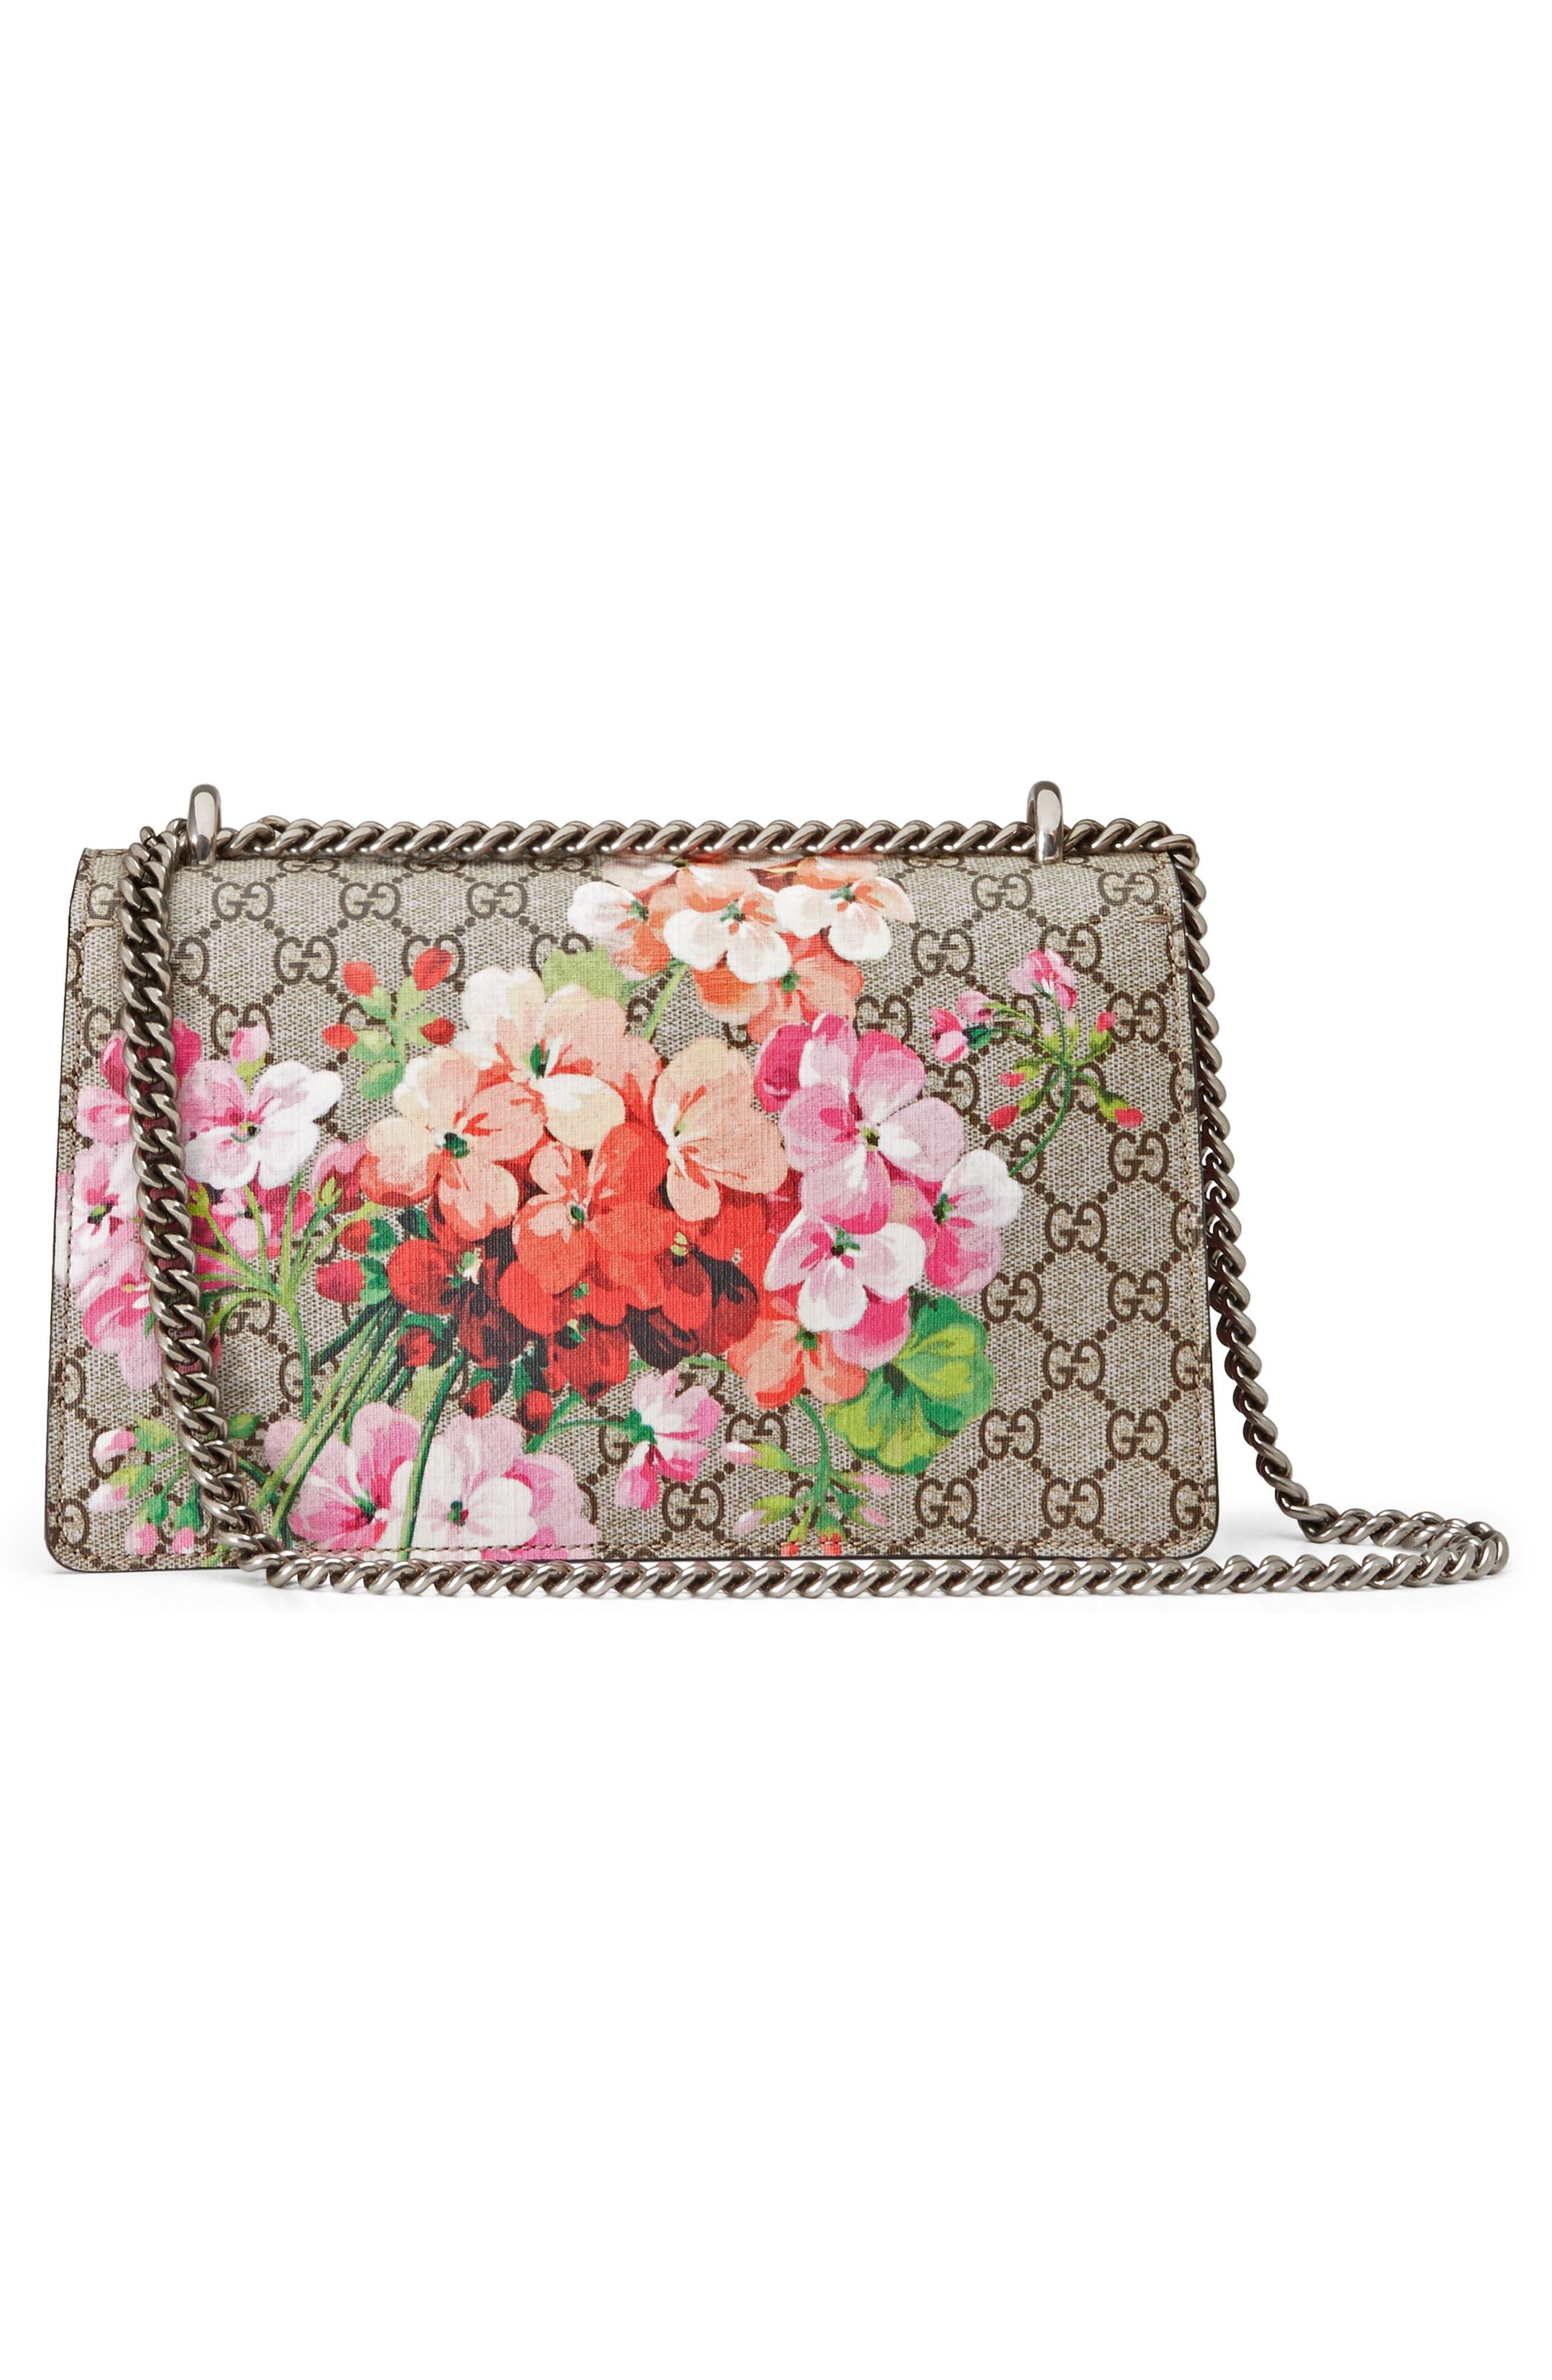 Small Dionysus Floral GG Supreme Canvas Shoulder Bag,                             Alternate thumbnail 2, color,